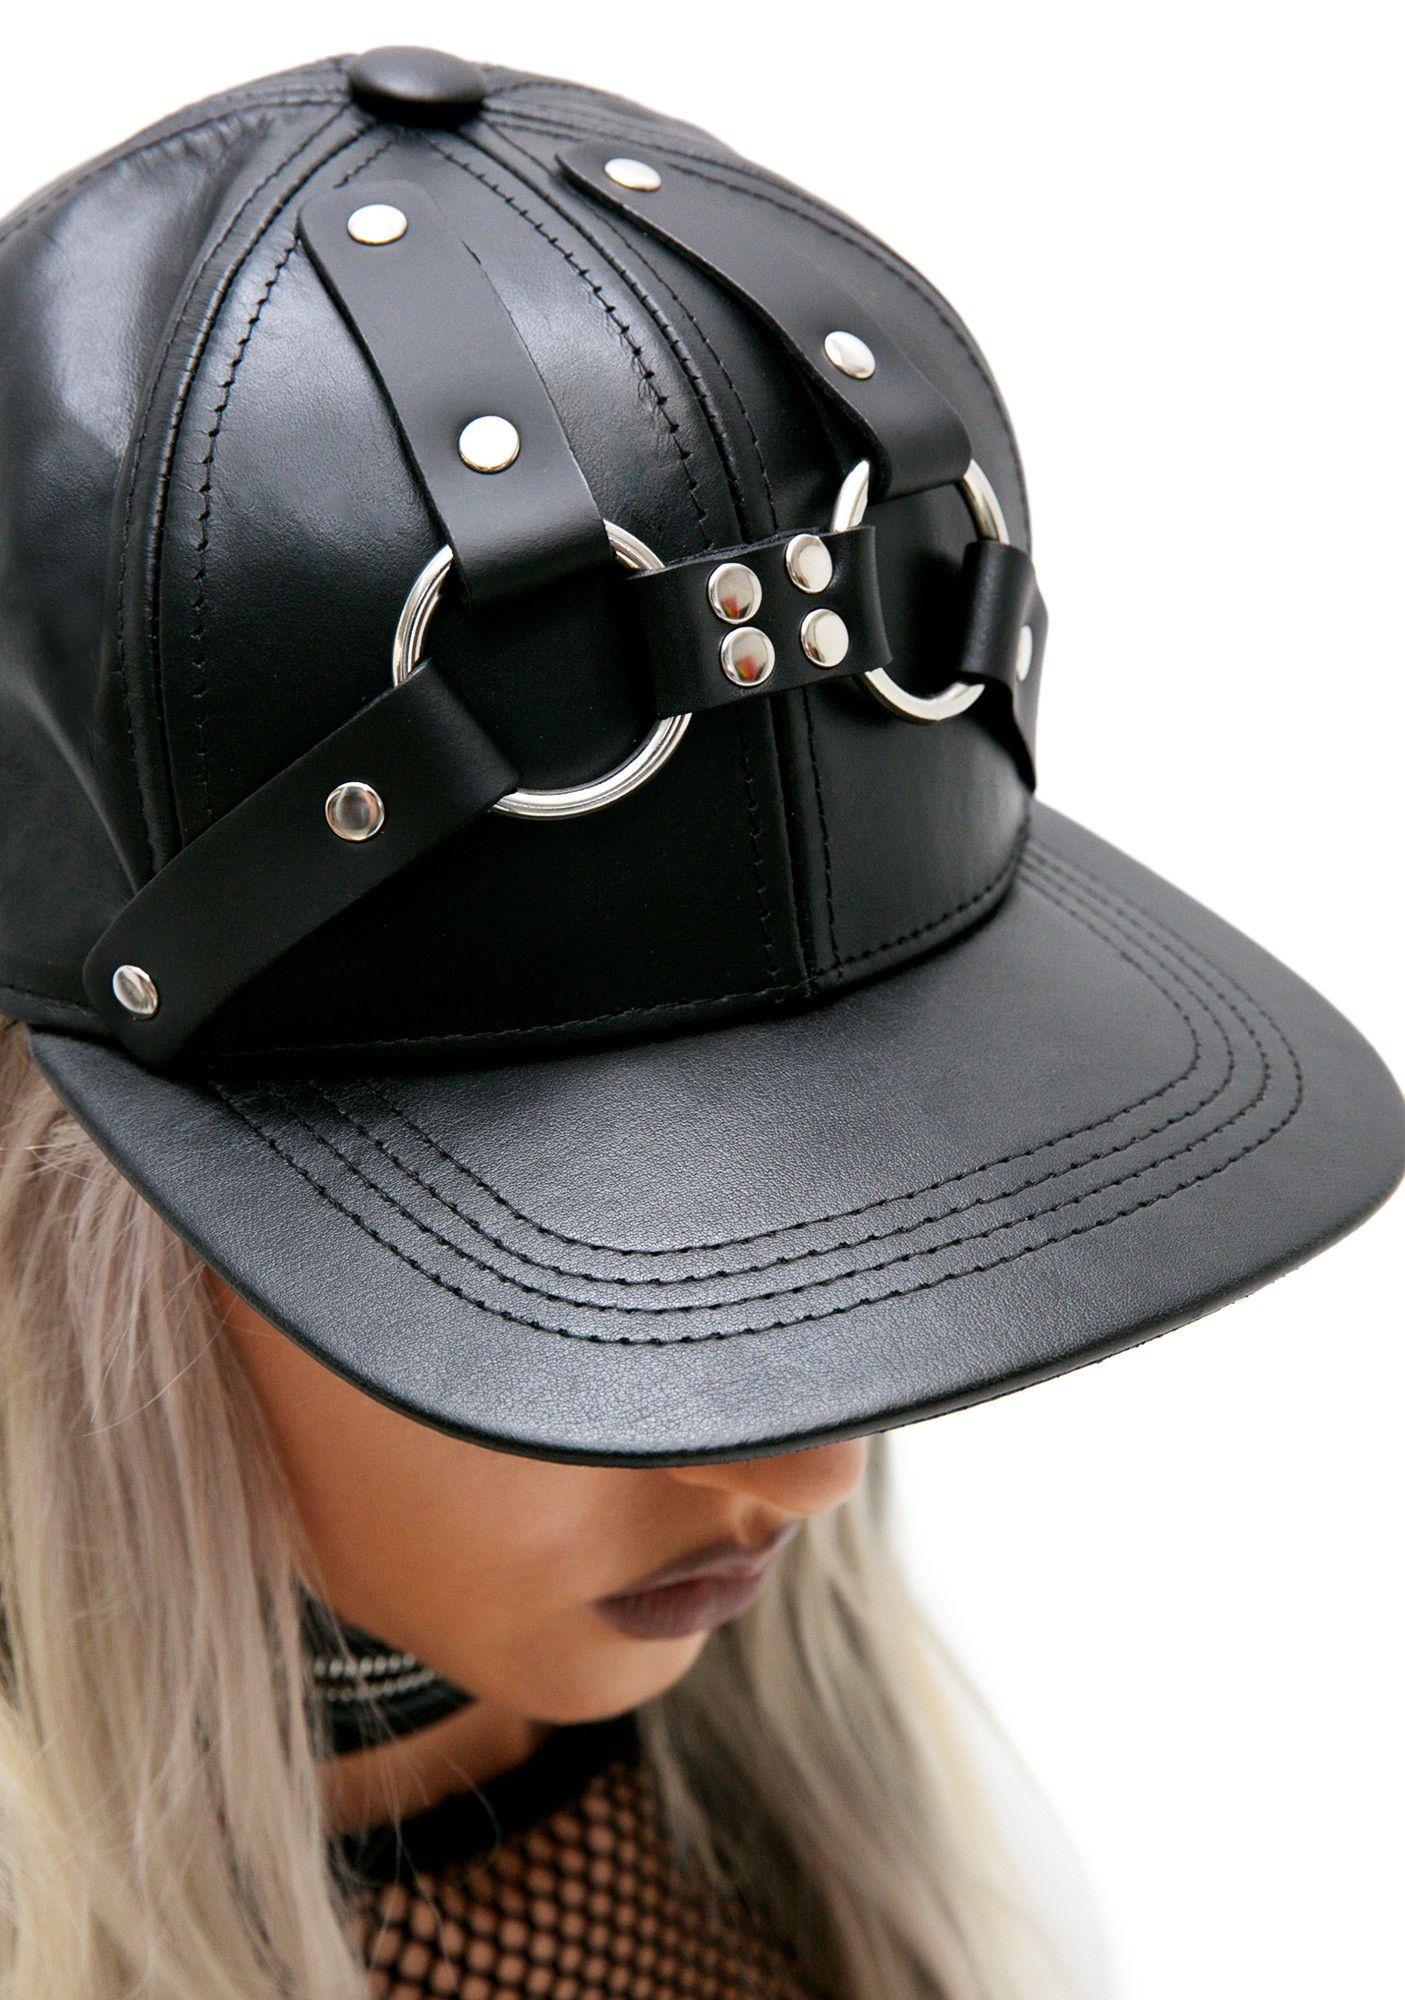 ACCESSORIES - Hats Alternative v77BlVUxfH